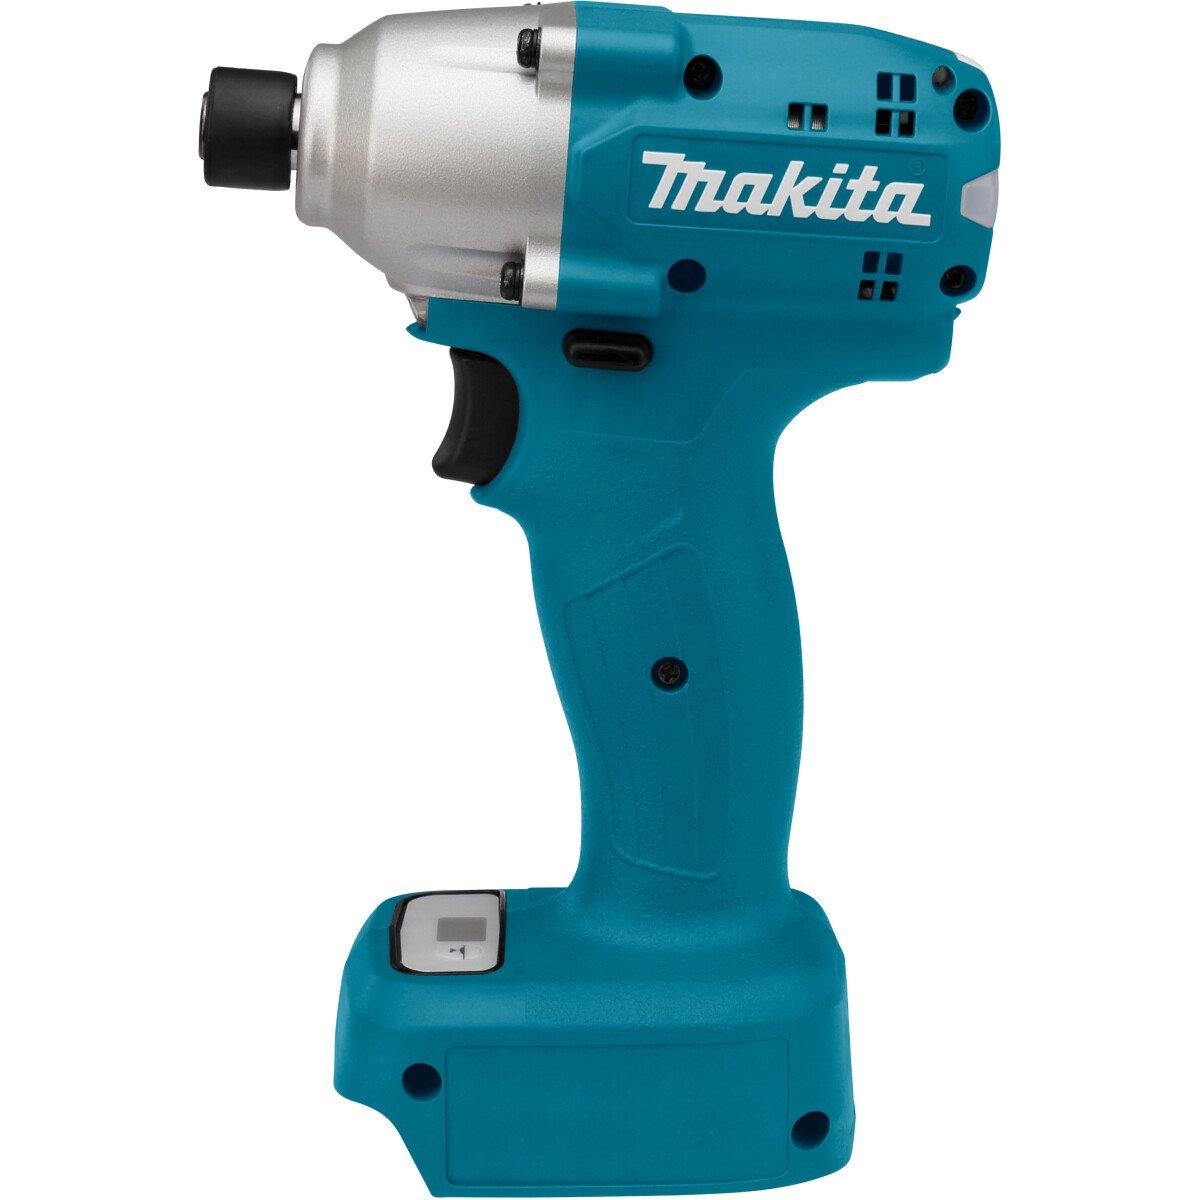 Makita DTDA070Z 14.4v Body Only Brushless Impact Driver